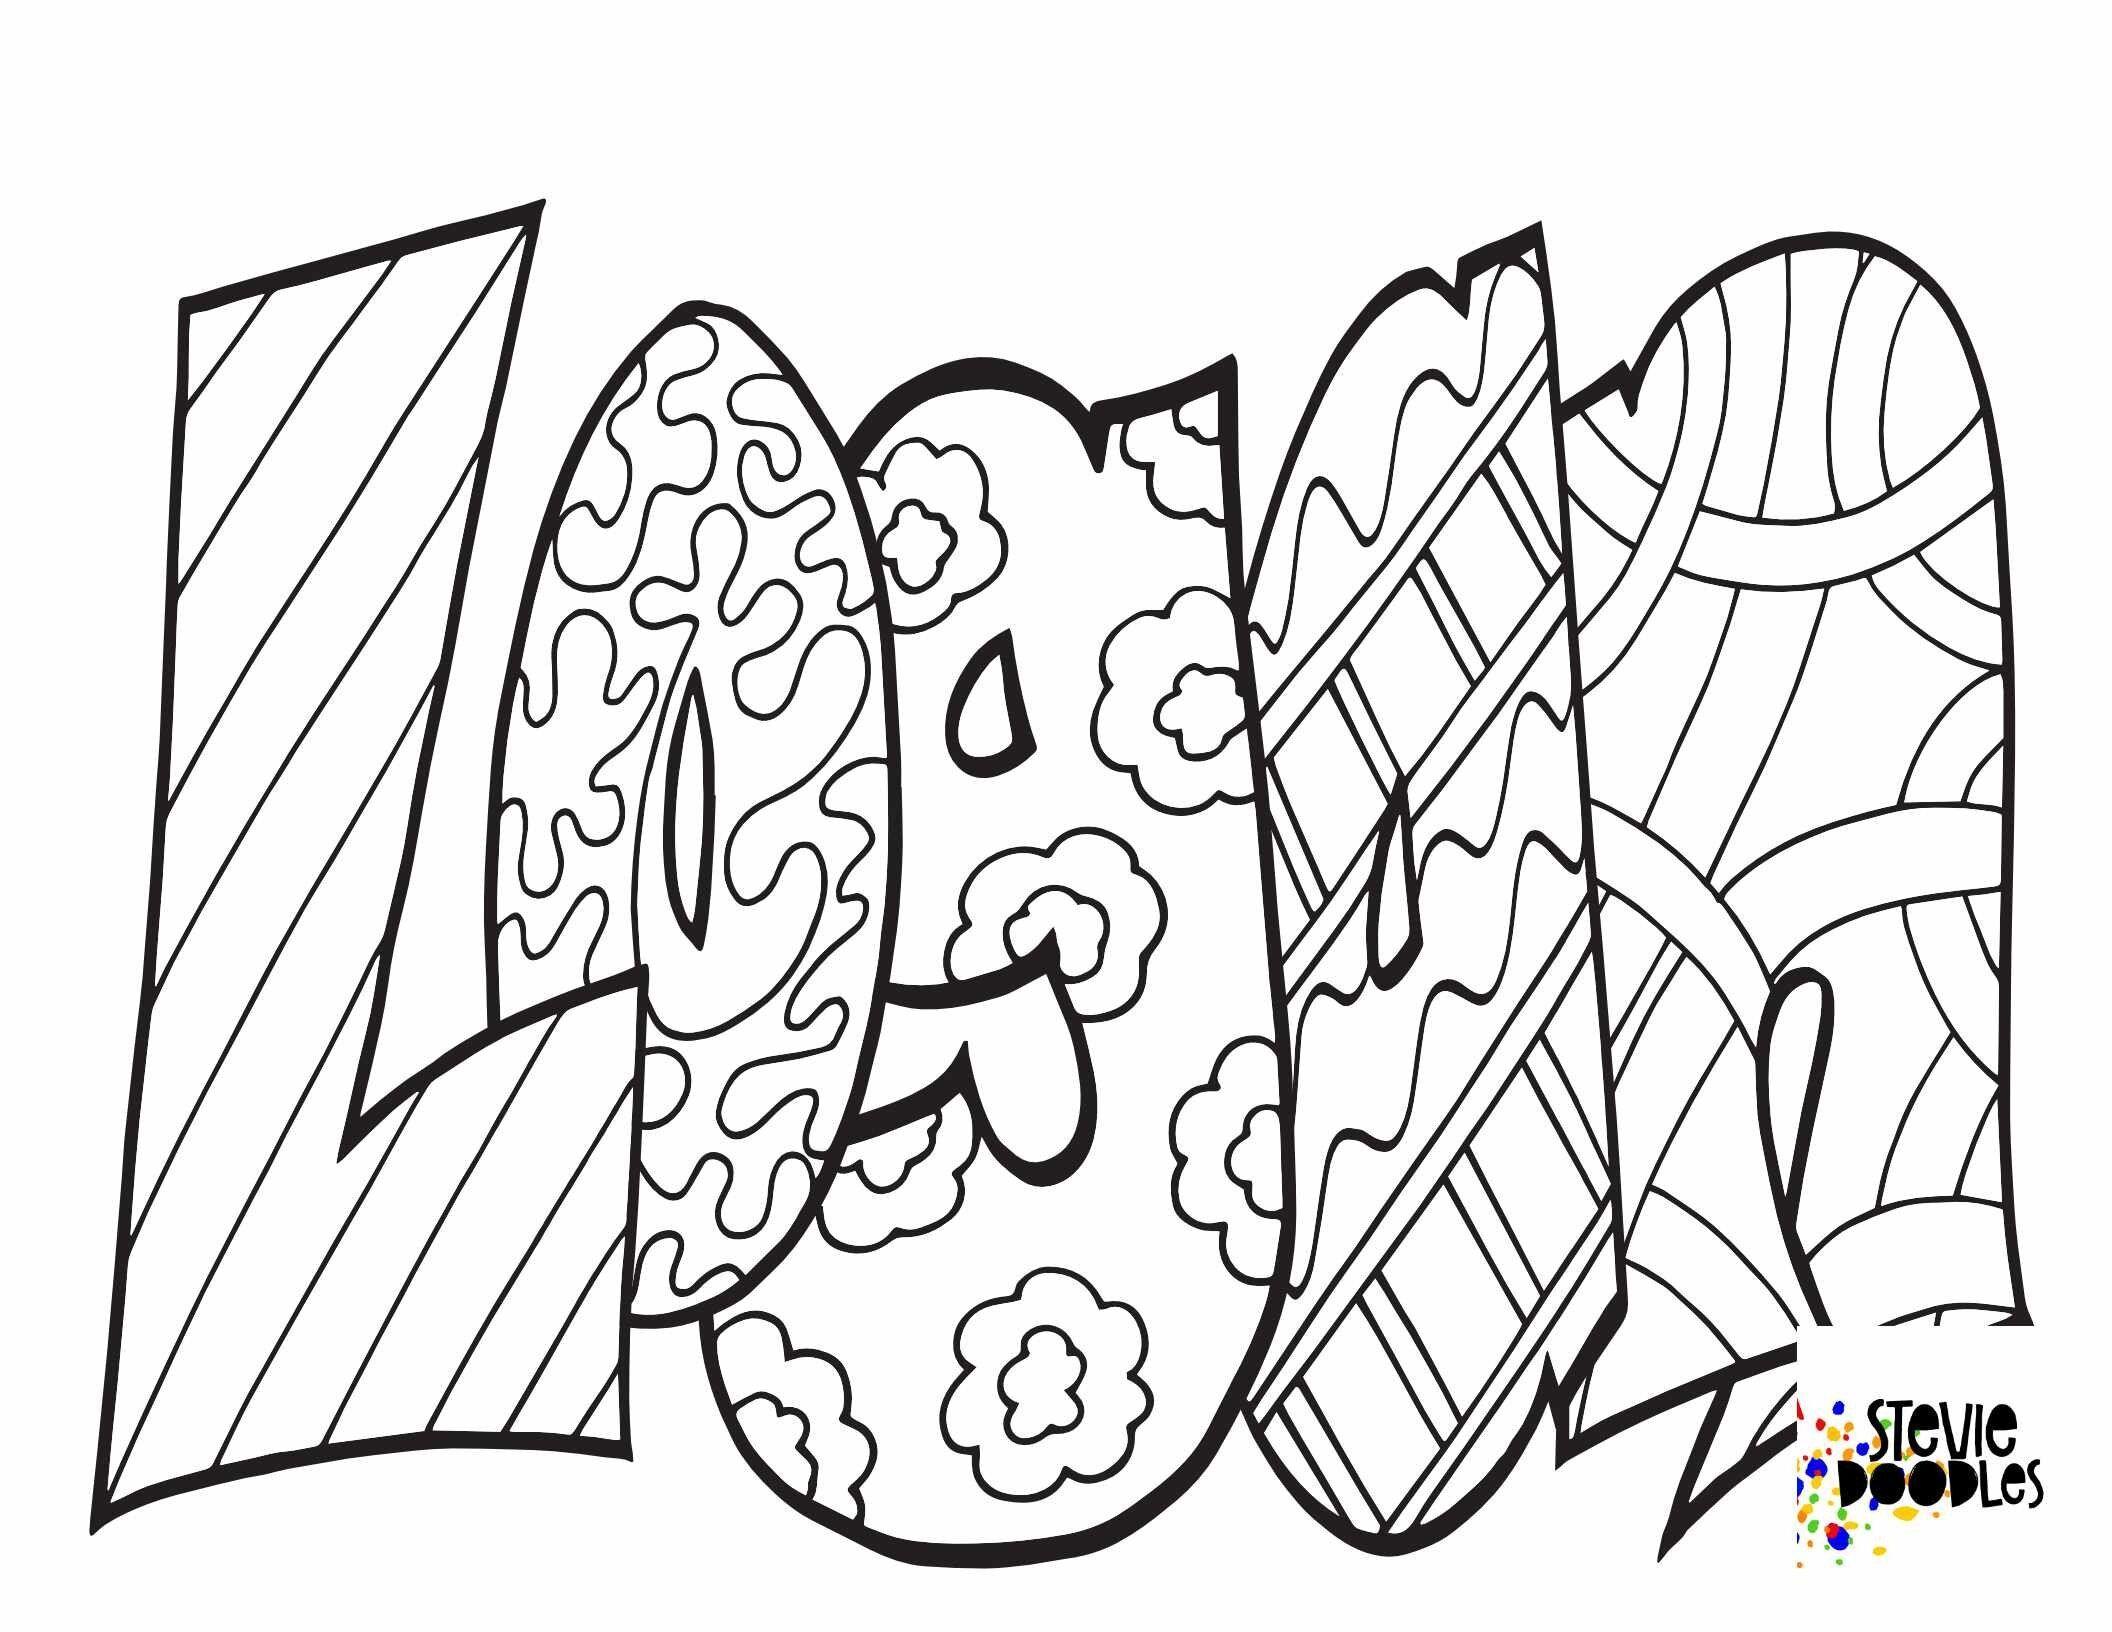 Logan Free Custom Name Printable Coloring Page Stevie Doodles Coloring Pages Free Printable Coloring Pages Name Coloring Pages [ 1632 x 2112 Pixel ]